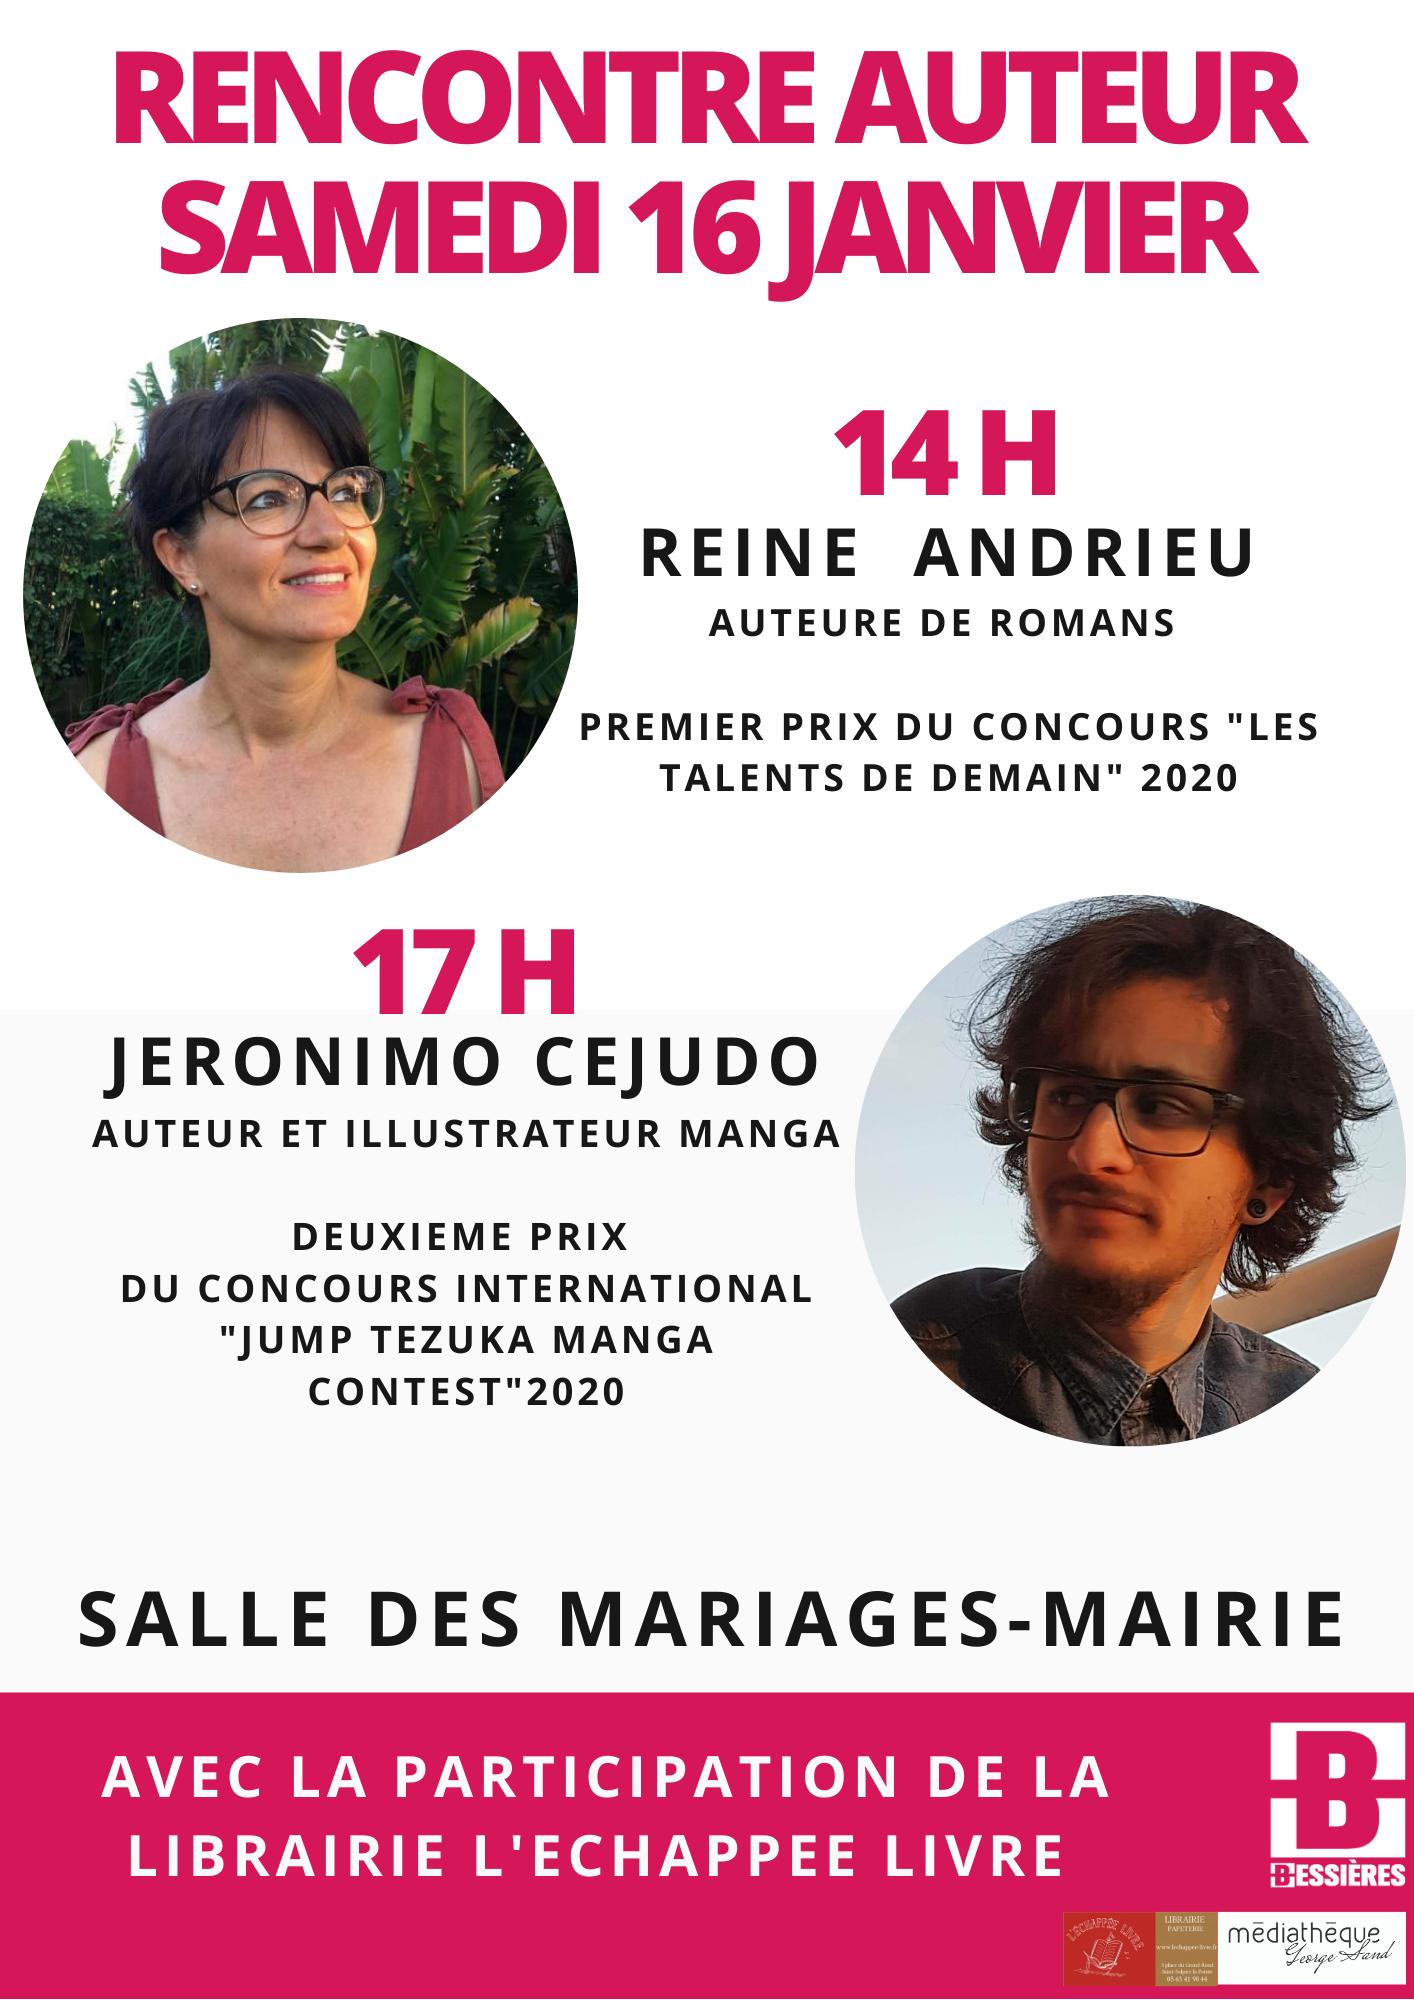 MÉDIATHÈQUE – RENCONTRE DÉDICACE : REINE ANDRIEU ET JERONIMO CEJUDO